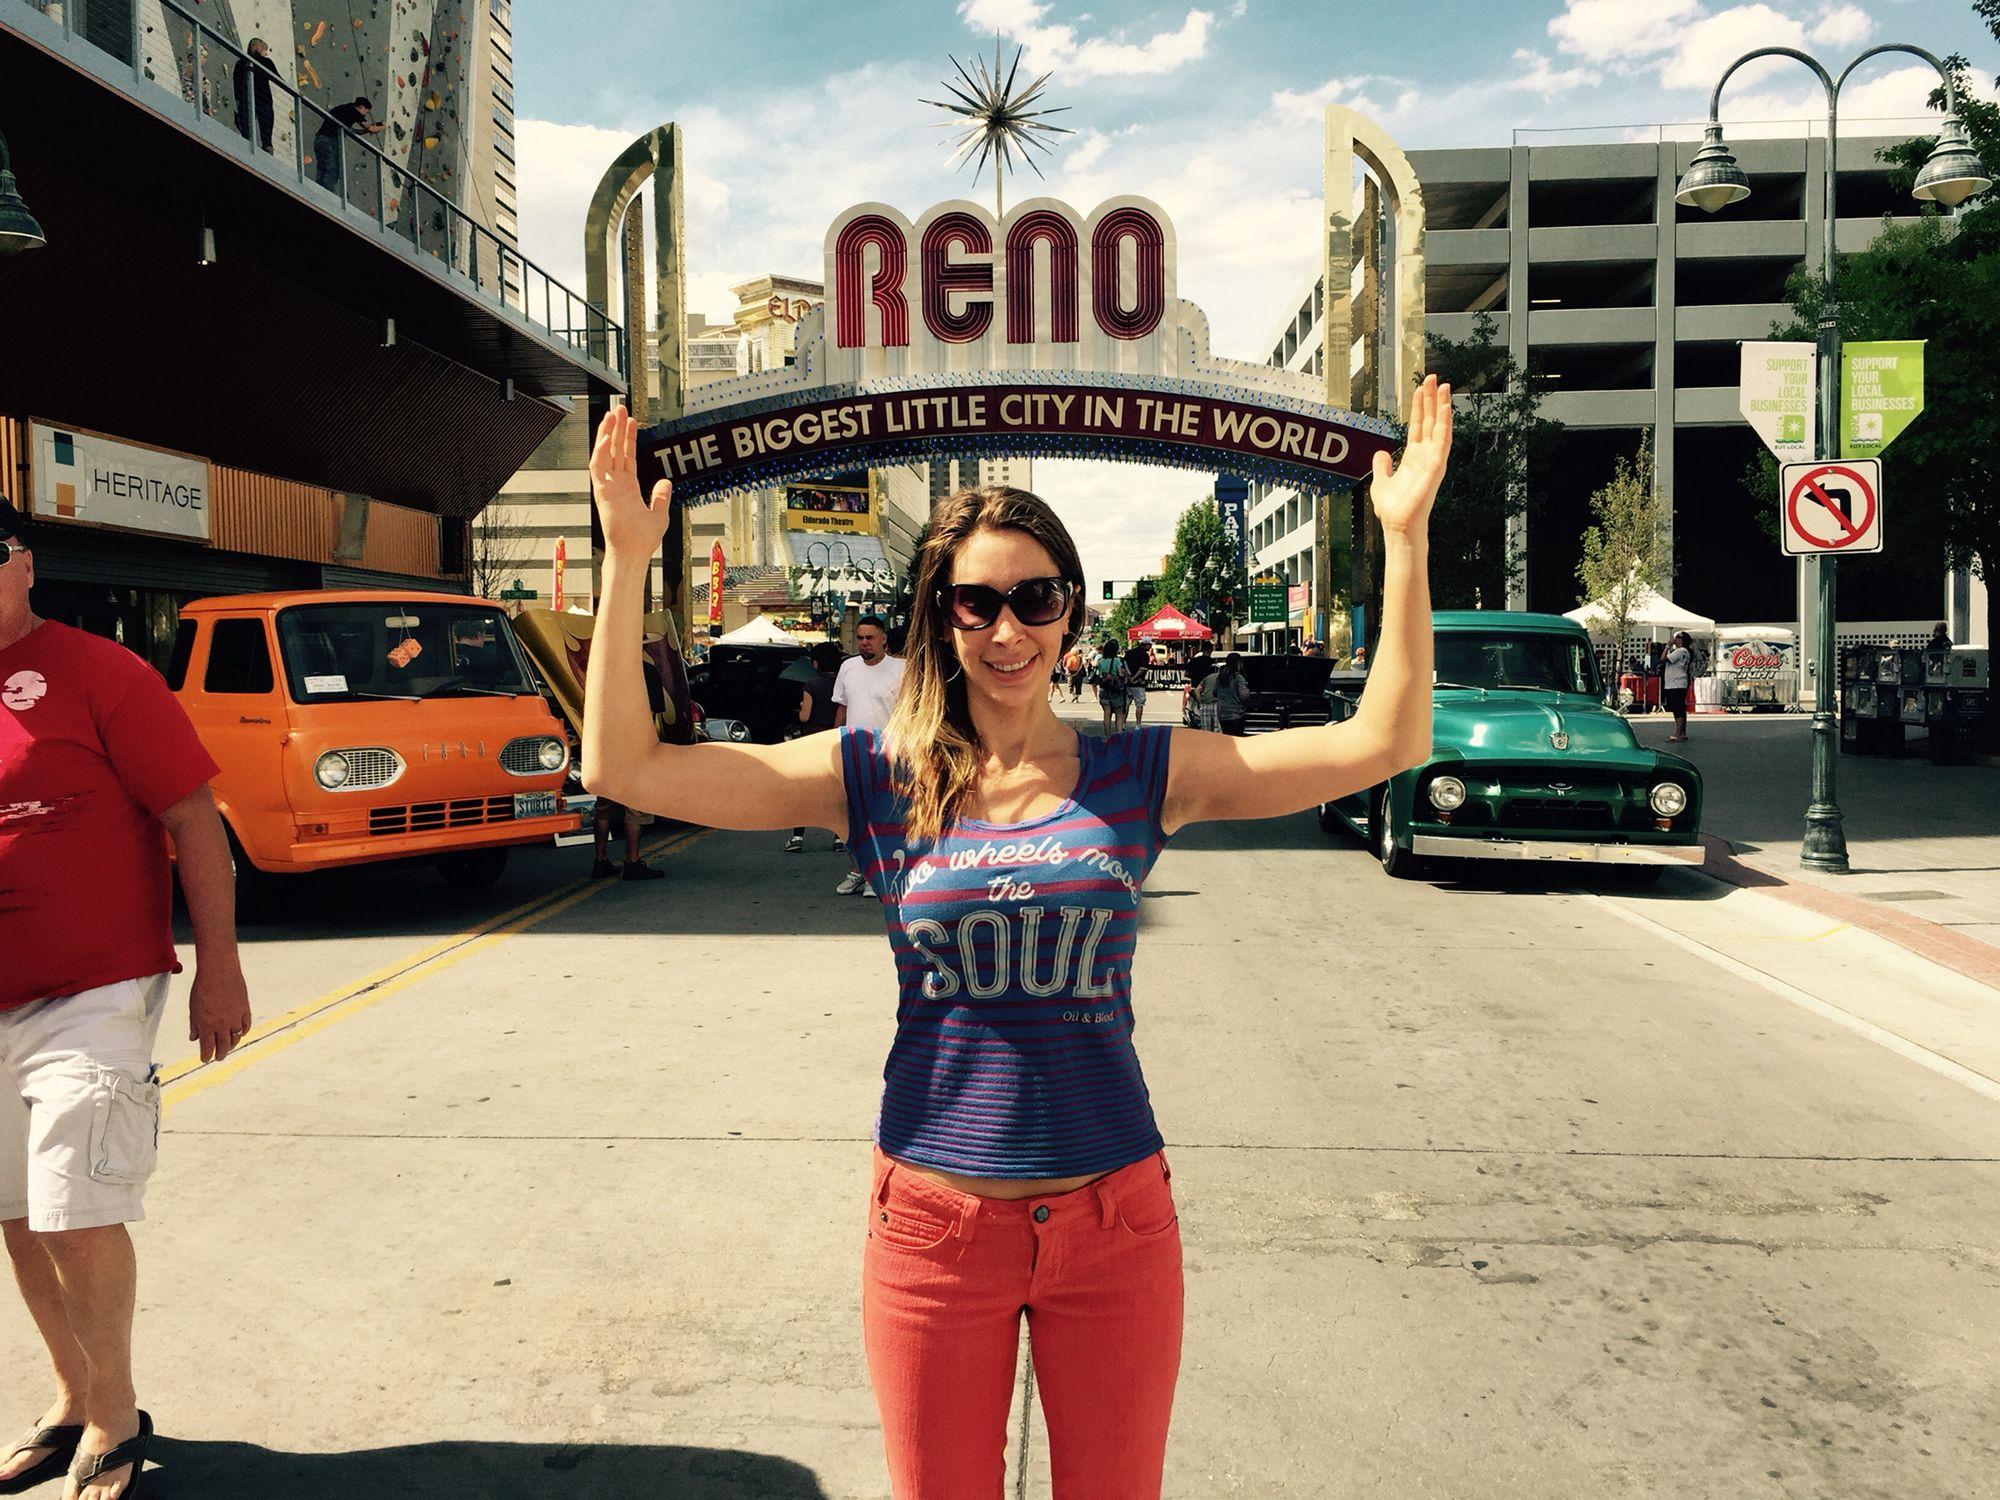 Reno for a car show